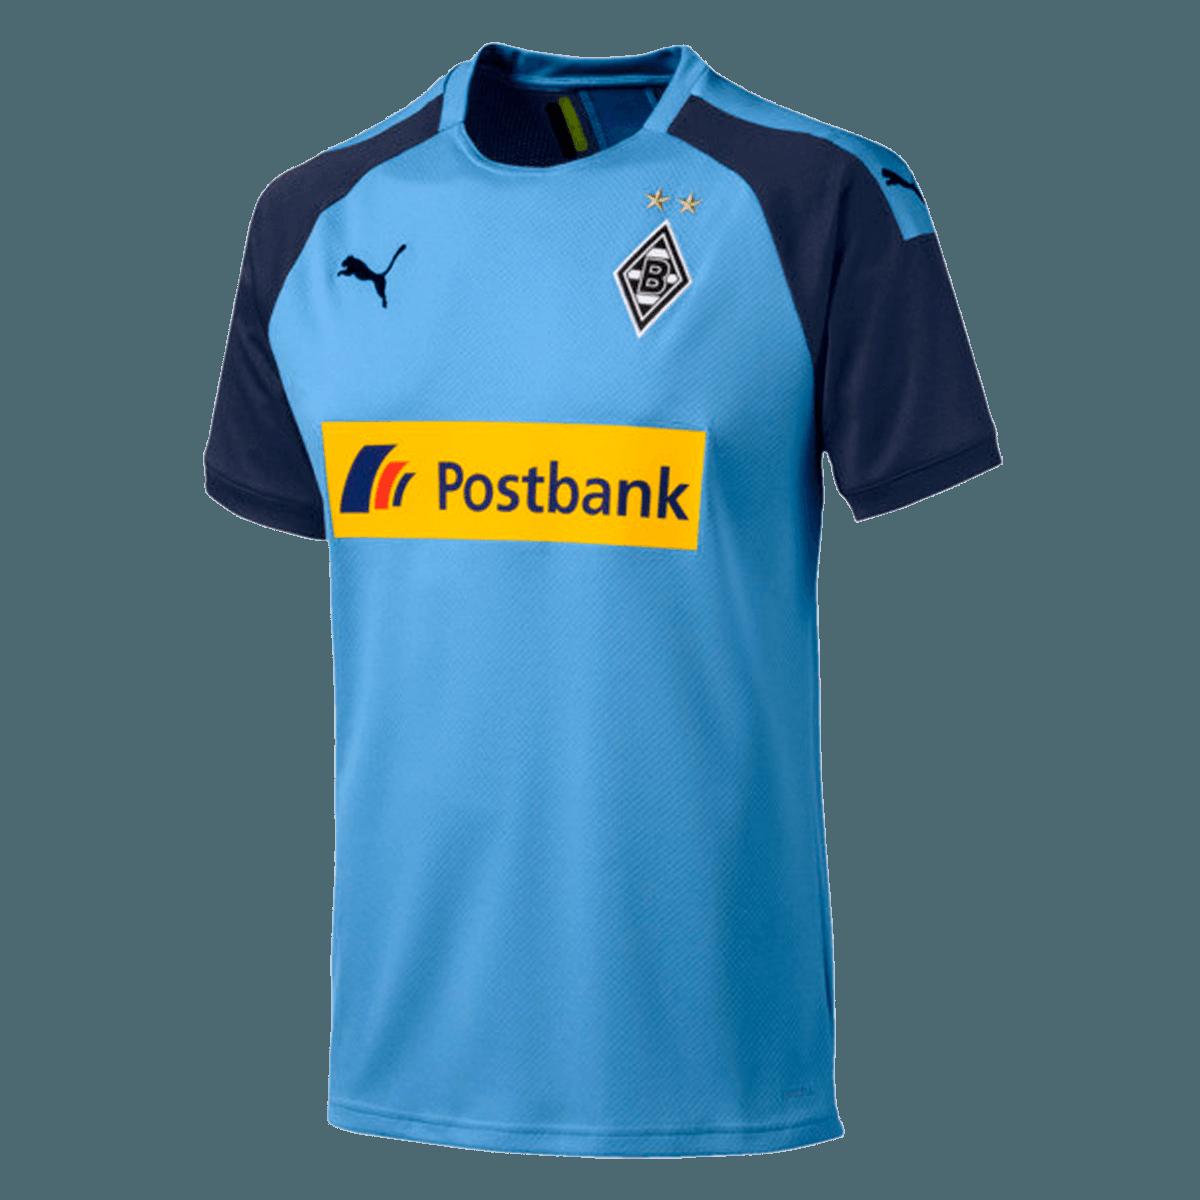 Wedden op Borussia Mönchengladbach: Bundesliga live stream